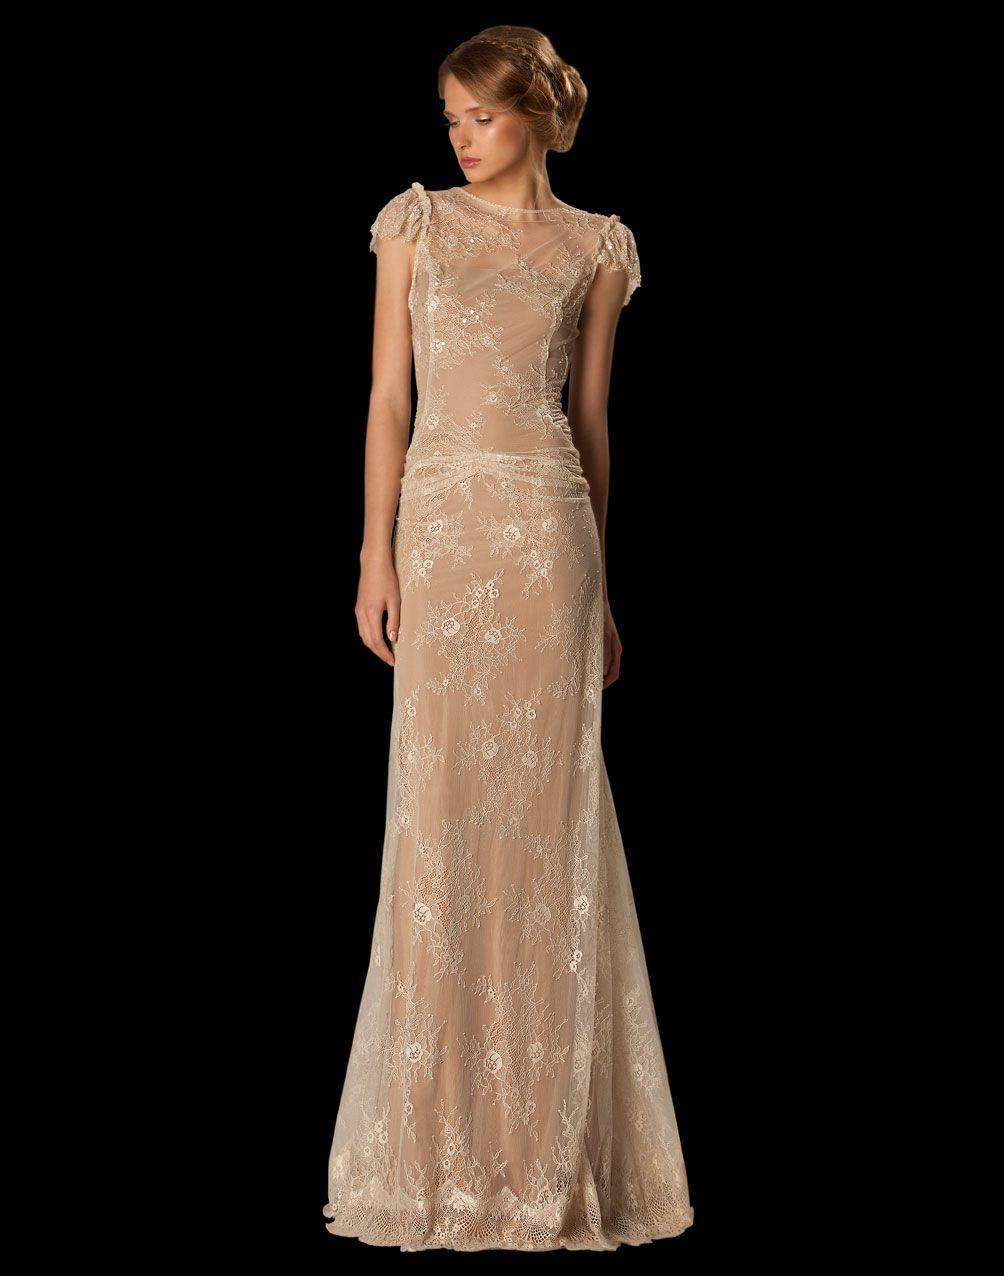 Anna anemomilou wedding dresses in kolonaki wedding dresses